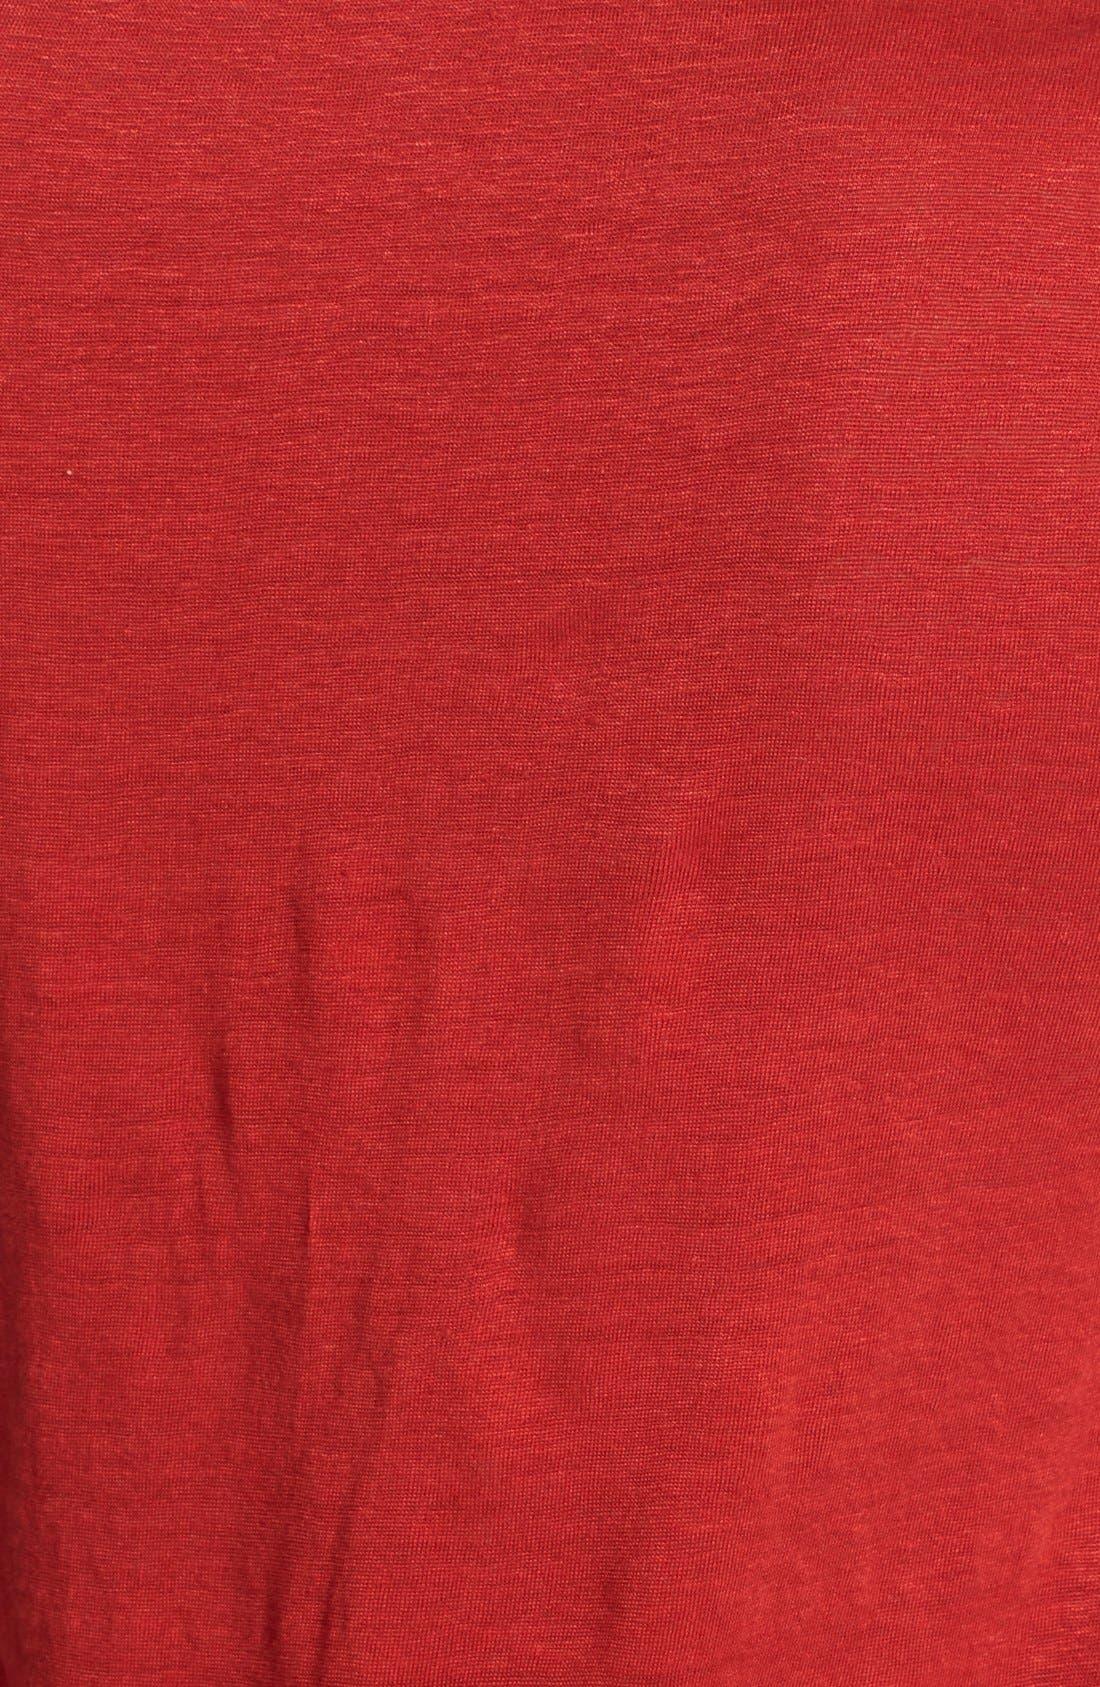 Alternate Image 3  - Eileen Fisher U-Neck Organic Linen A-Line Tee